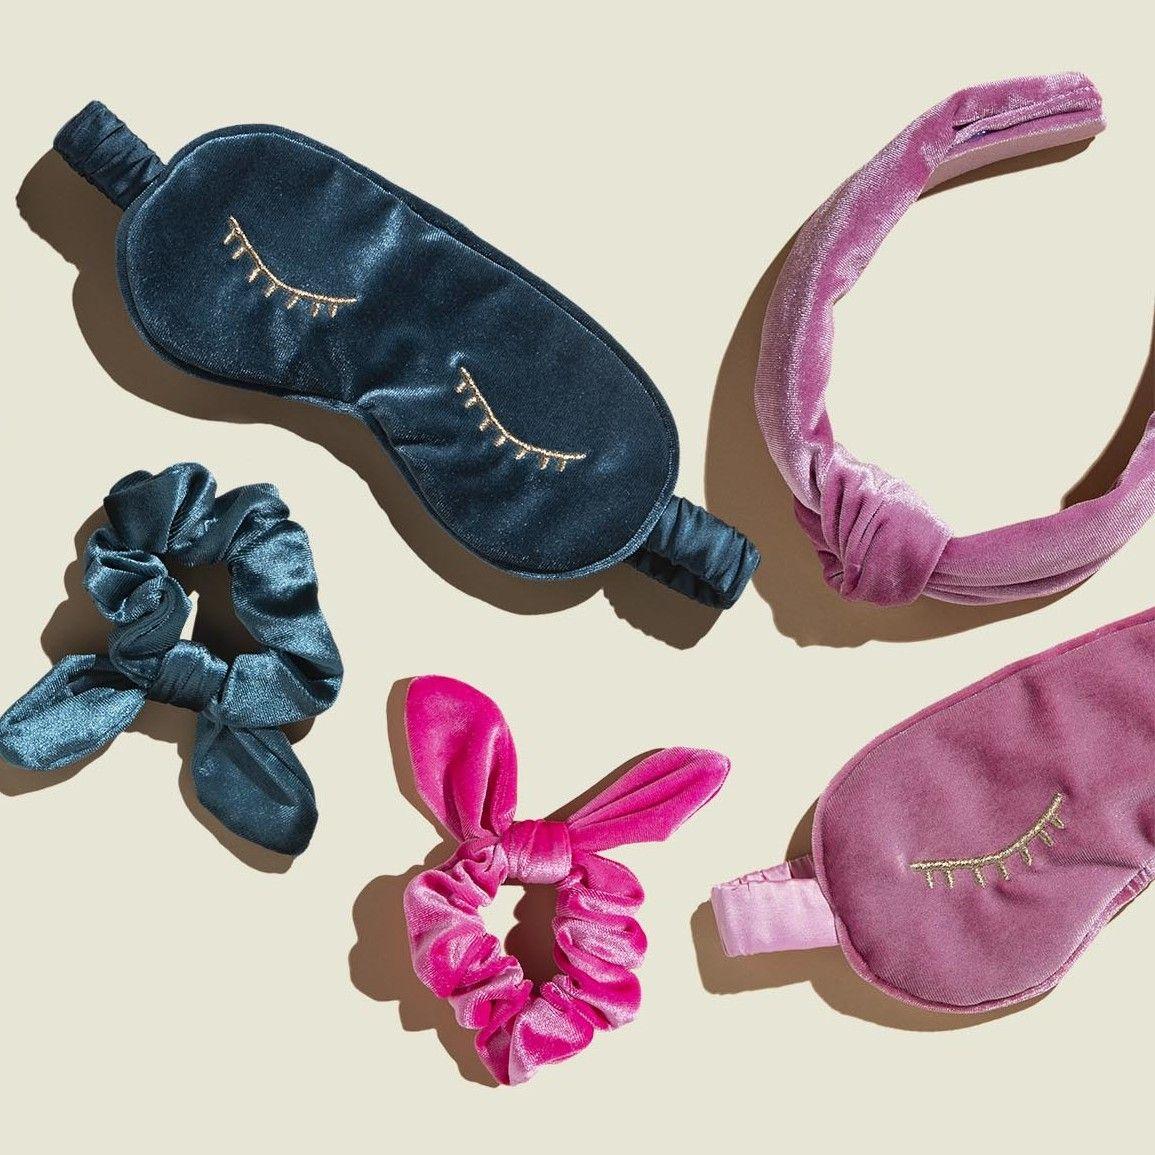 Velvet sleep masks with scrunchies and headband